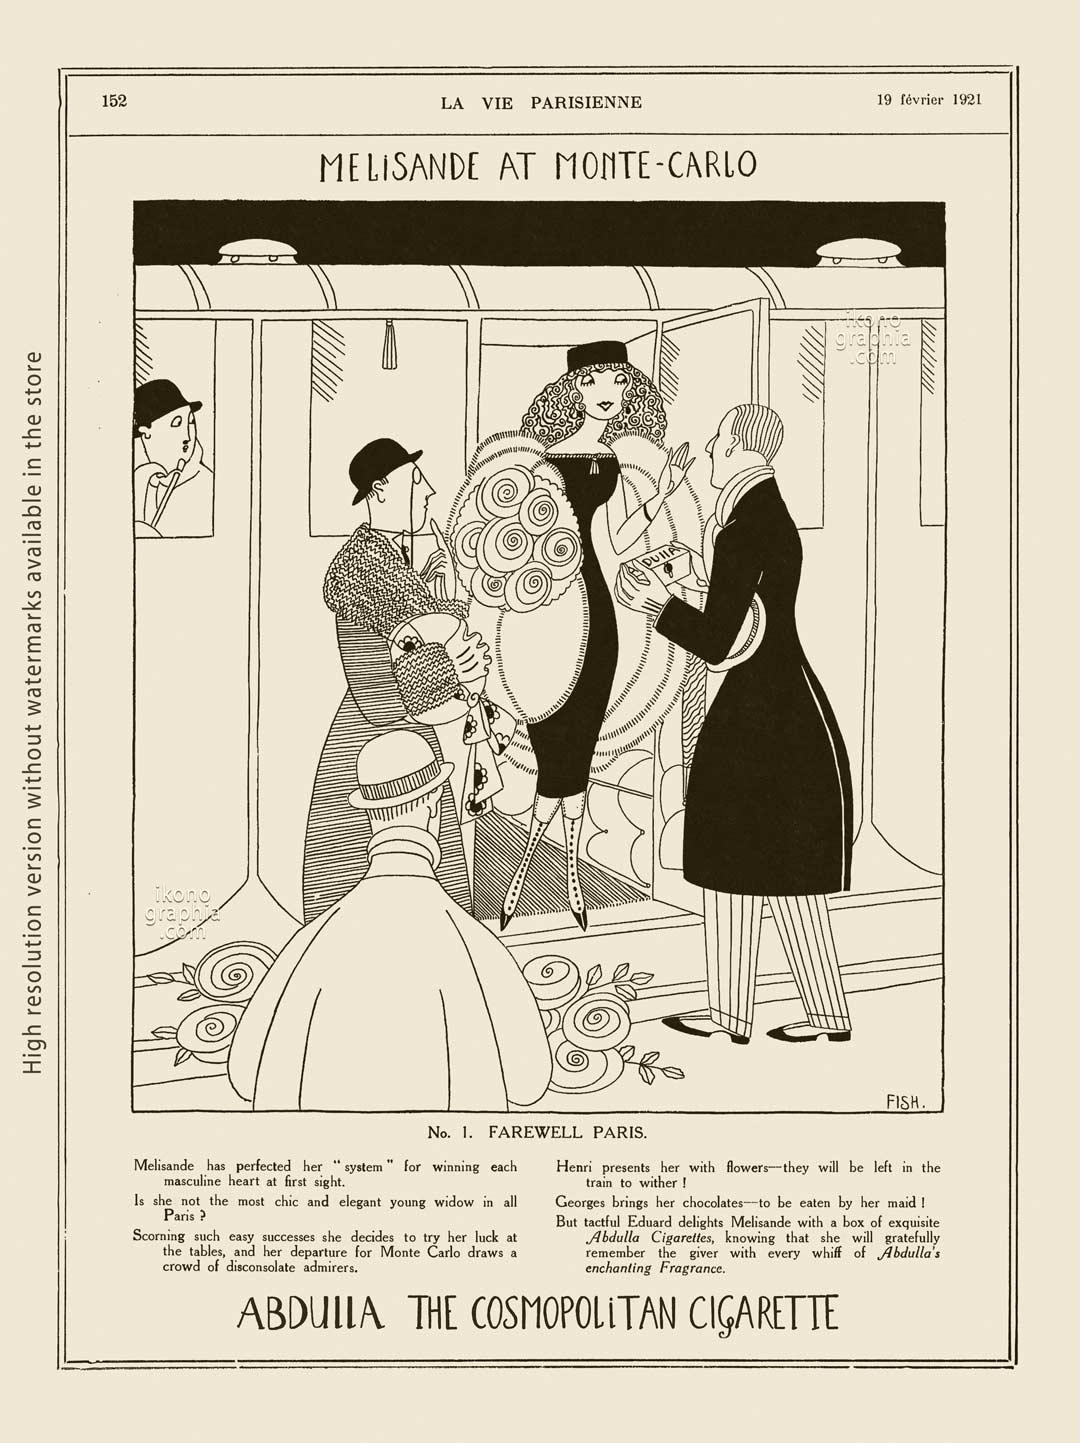 Abdulla Cigarettes Ad - Melisande at Montecarlo. No. 1. FAREWELL PARIS. La Vie Parisienne, February 19, 1921. Artwork by Anne Harriet Fish.